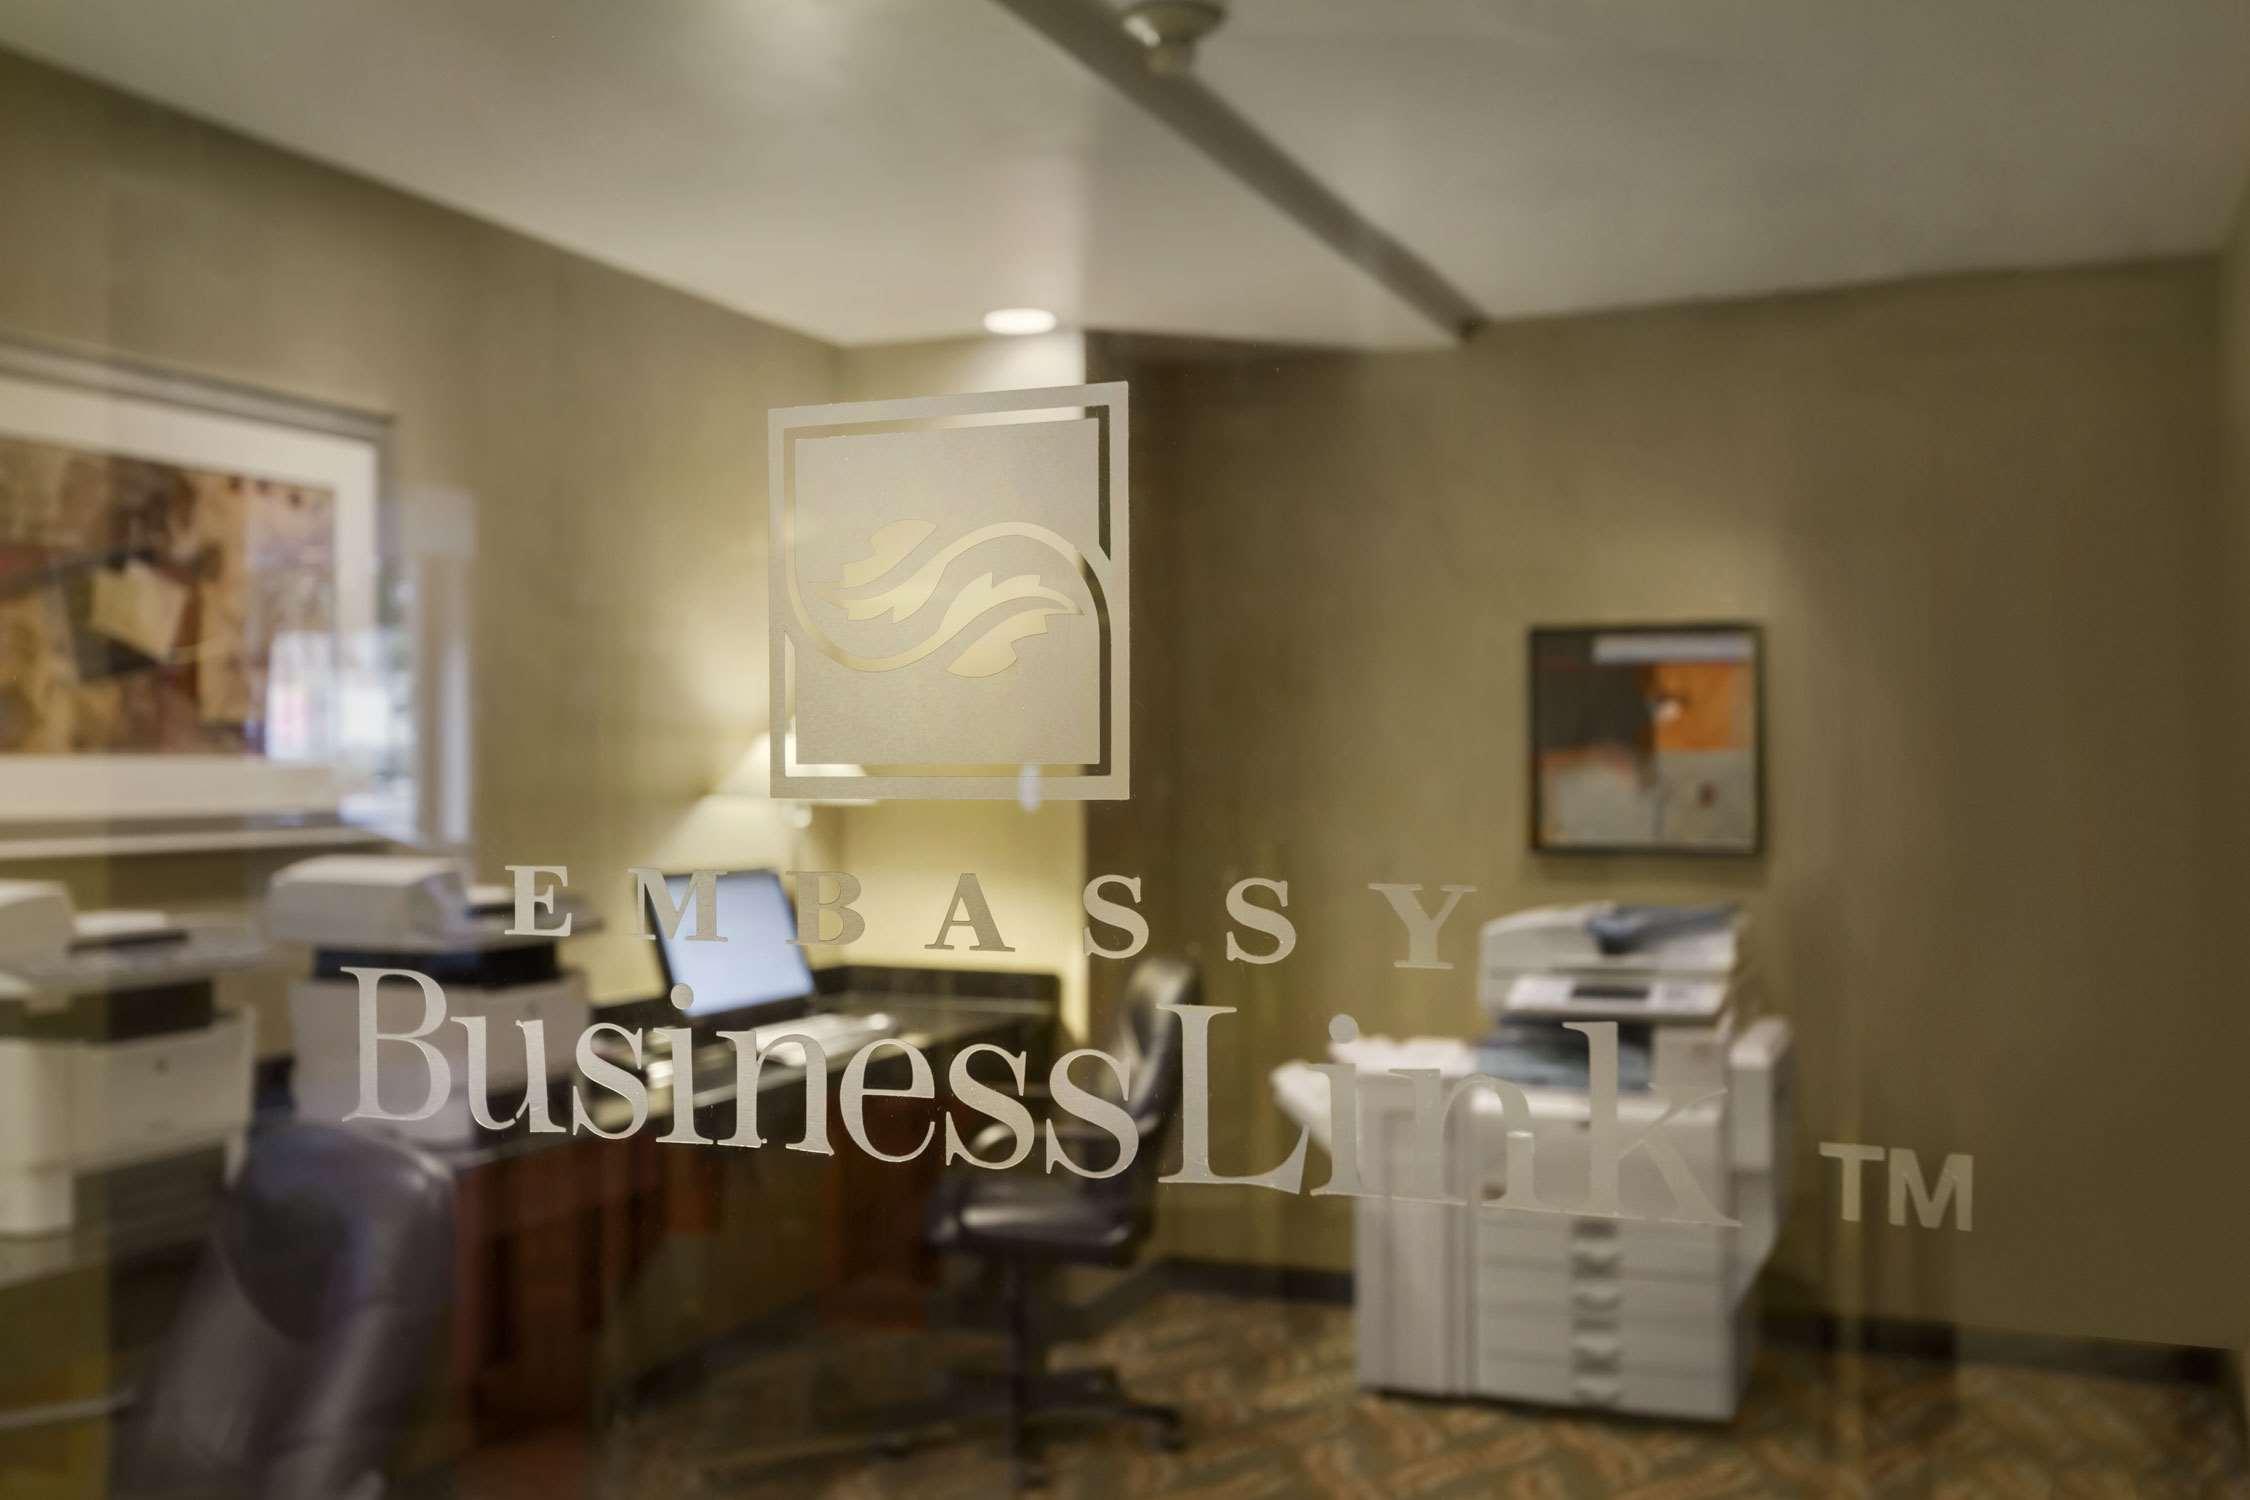 Embassy Suites by Hilton Winston Salem image 28